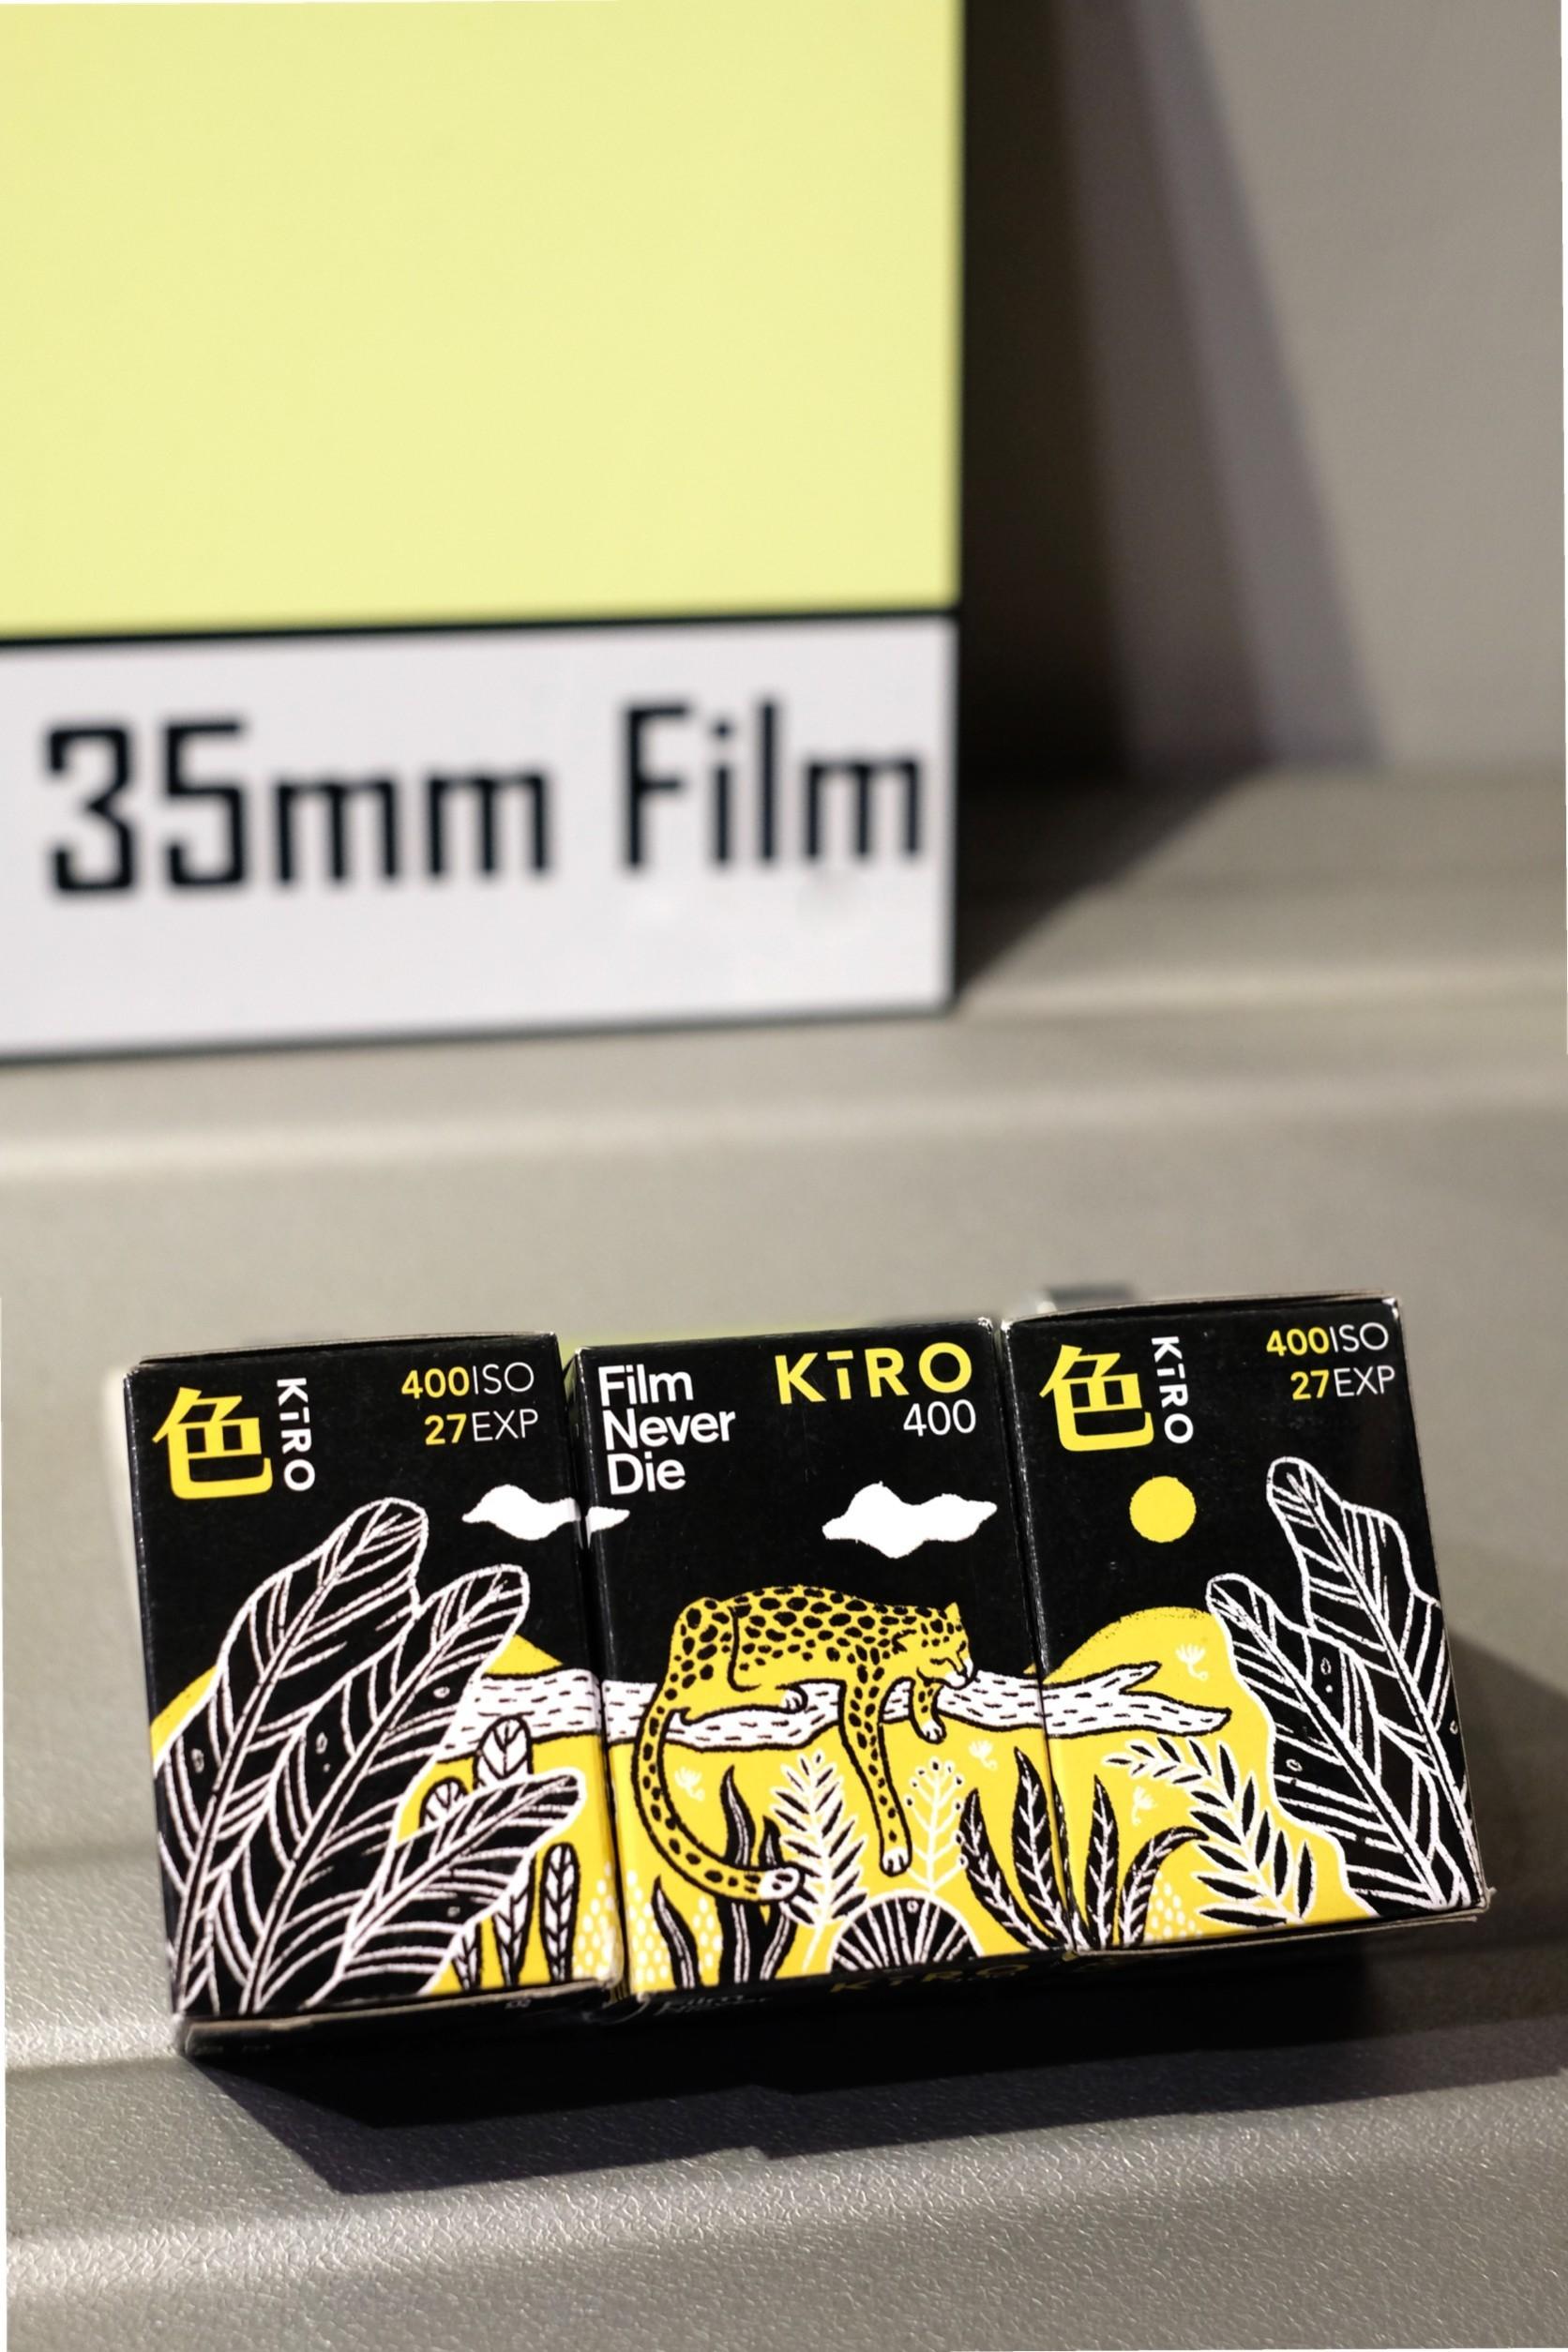 Film Never Die Kiro 400